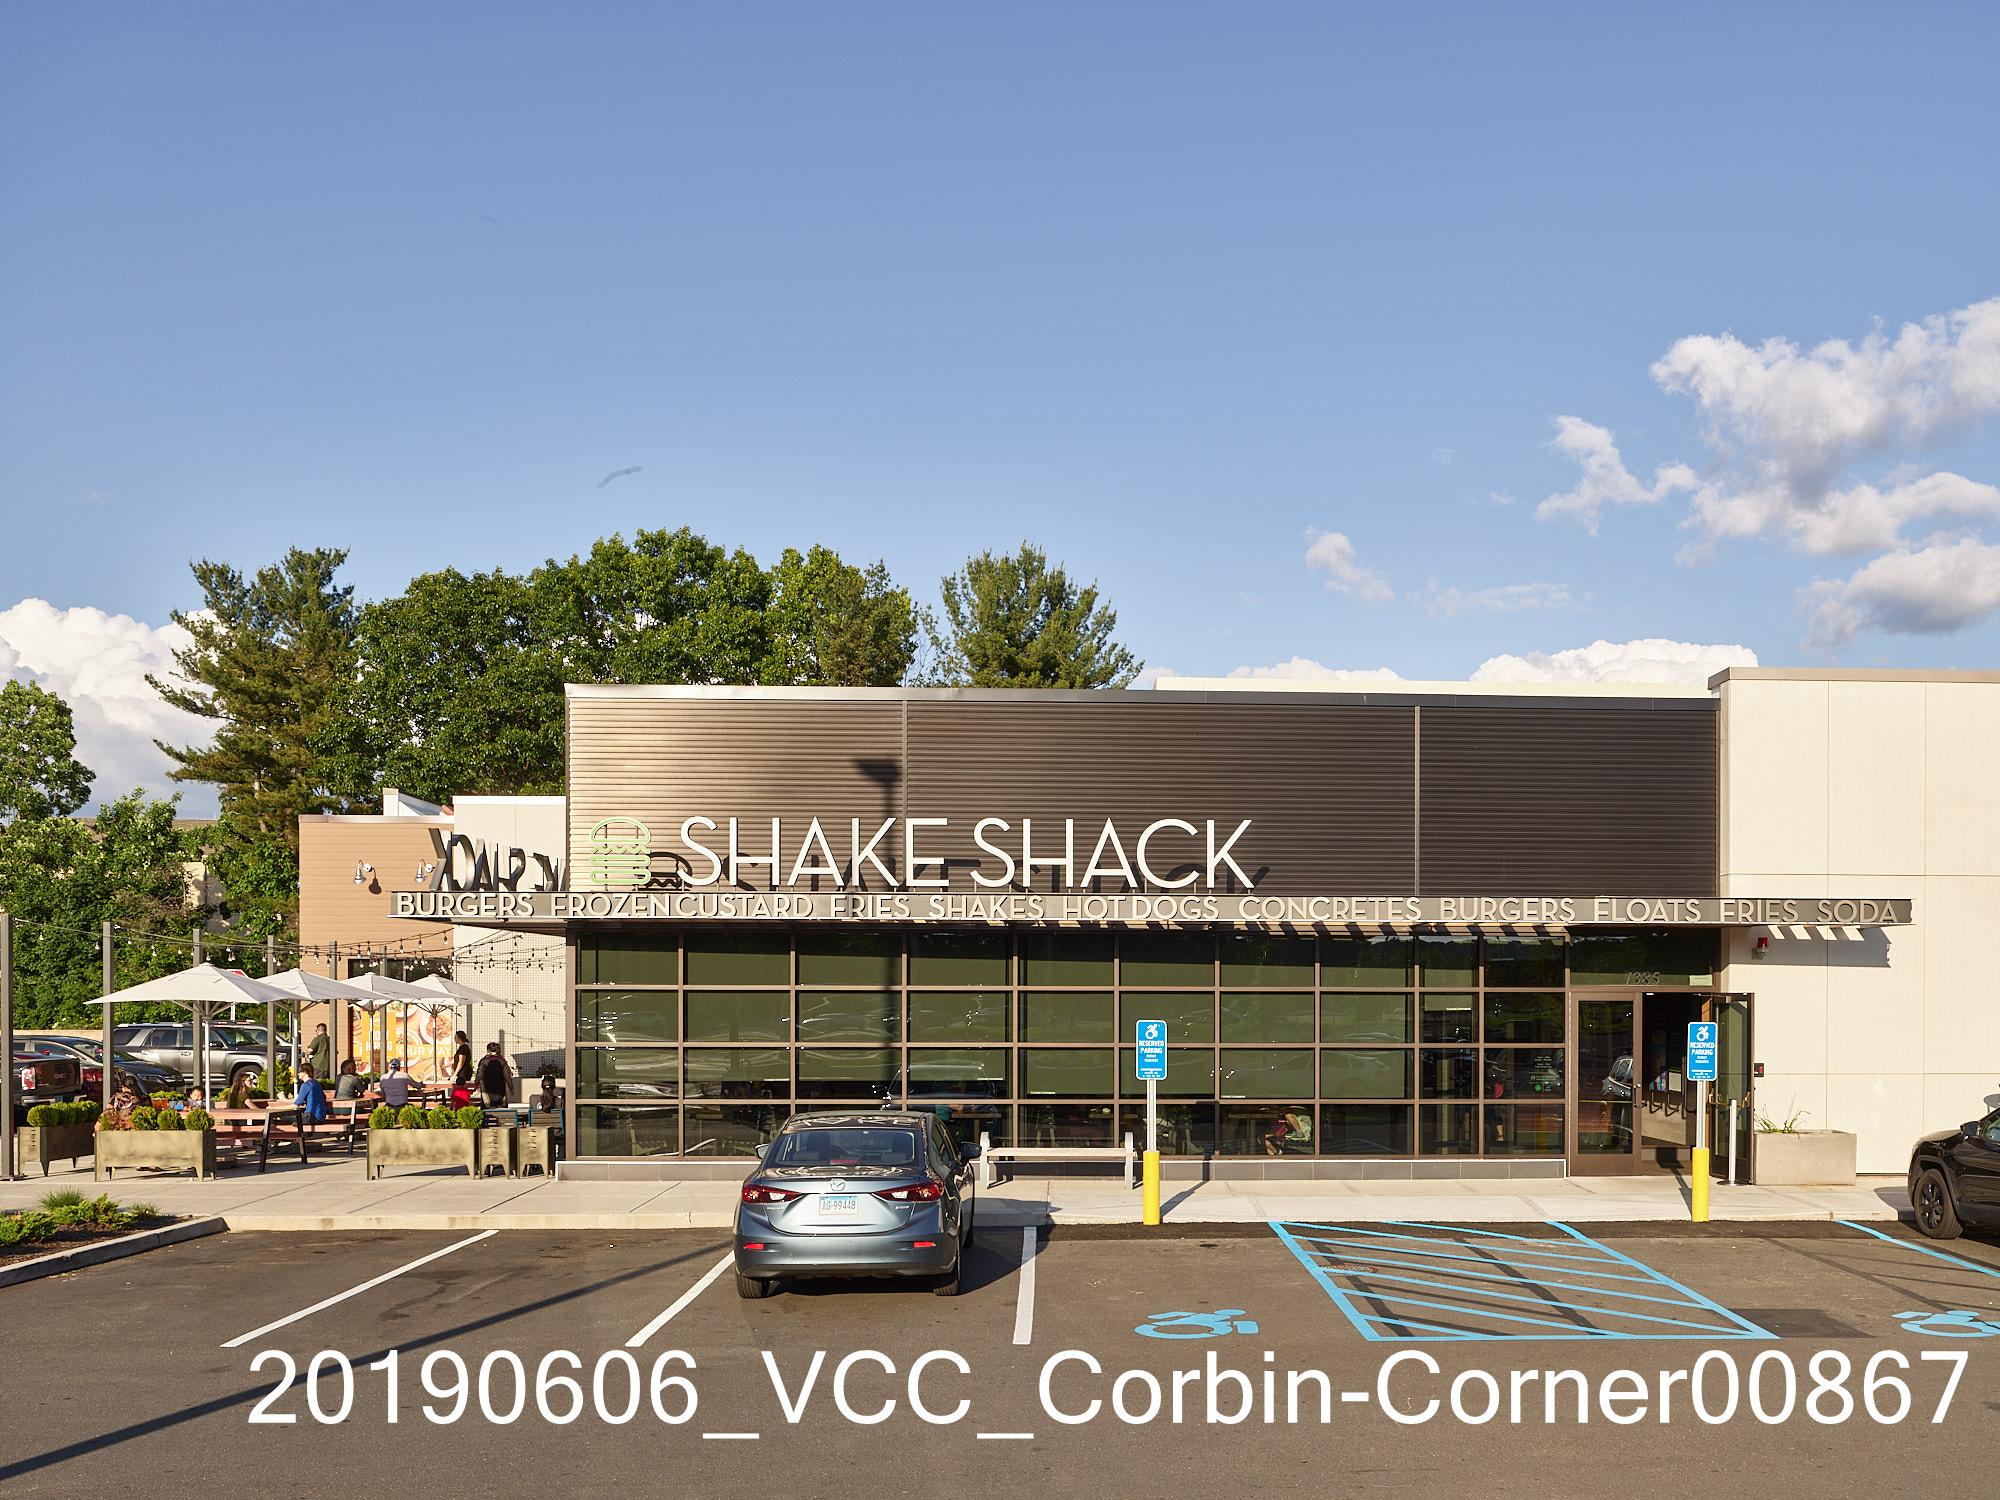 20190606_VCC_Corbin-Corner00867.jpg